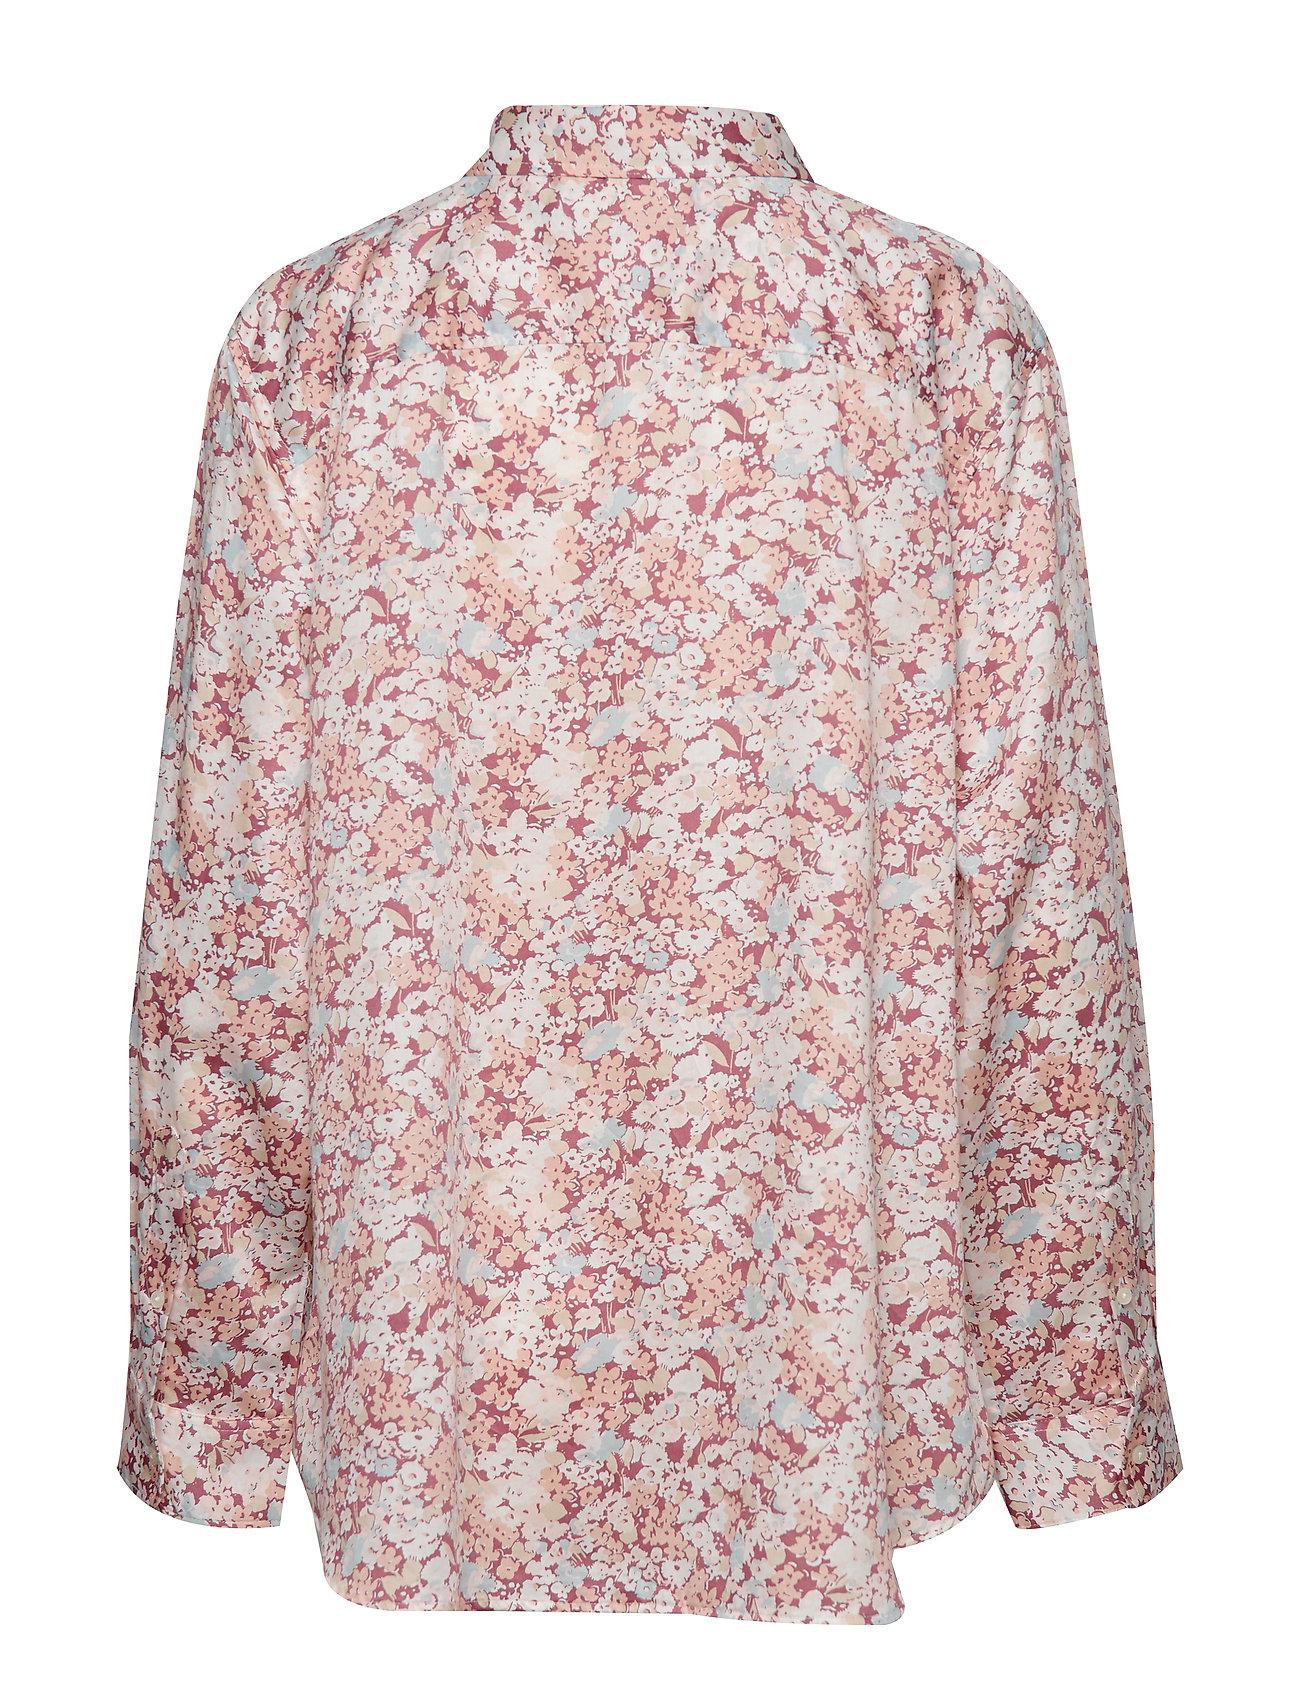 Raspberry Sleeve long shirtdark Jamelko MuLauren Women 8nwO0Pk